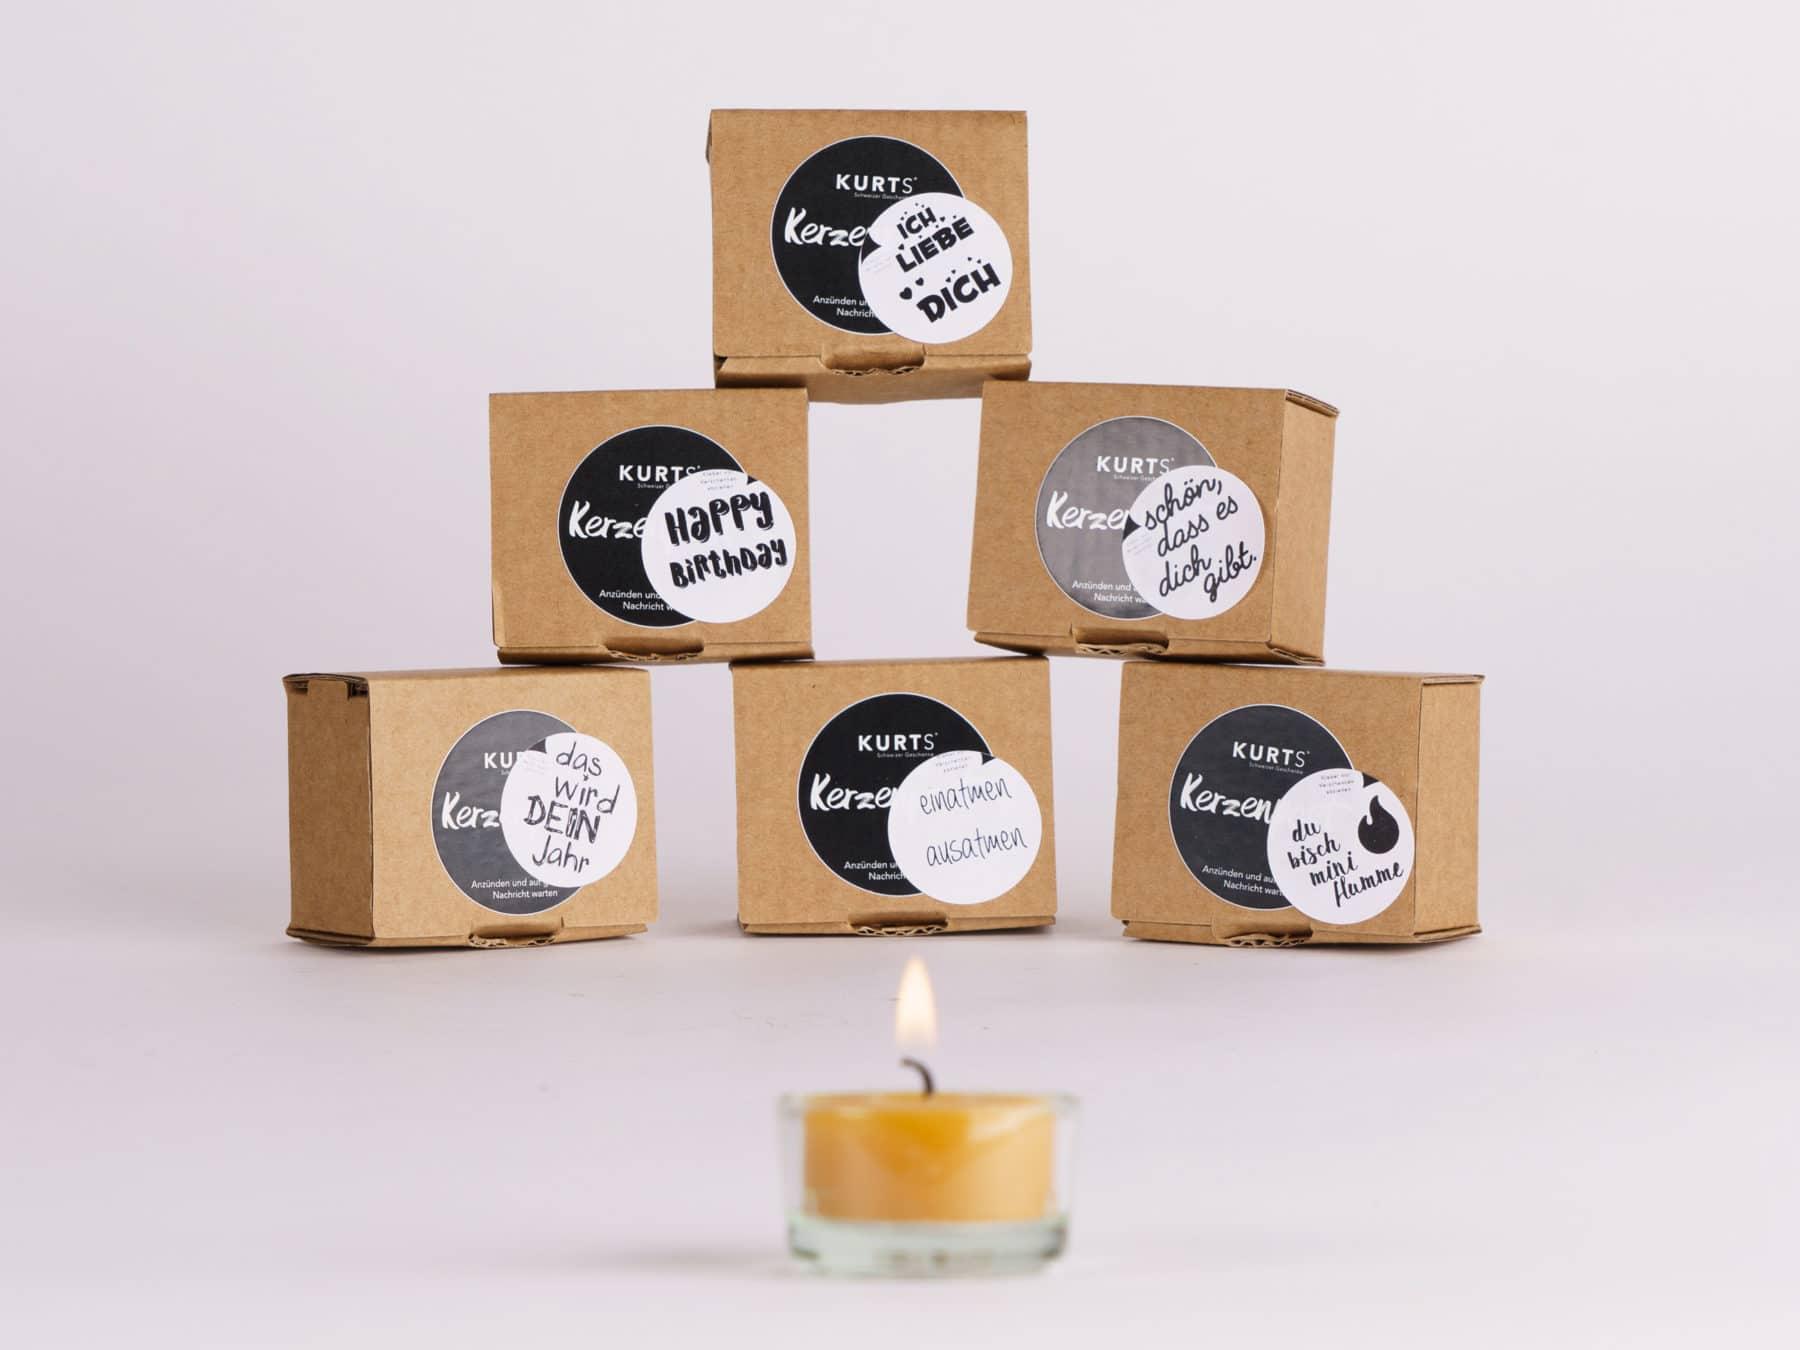 Teelicht Botschaft Message Candle Kurts Kerzenpost swiss